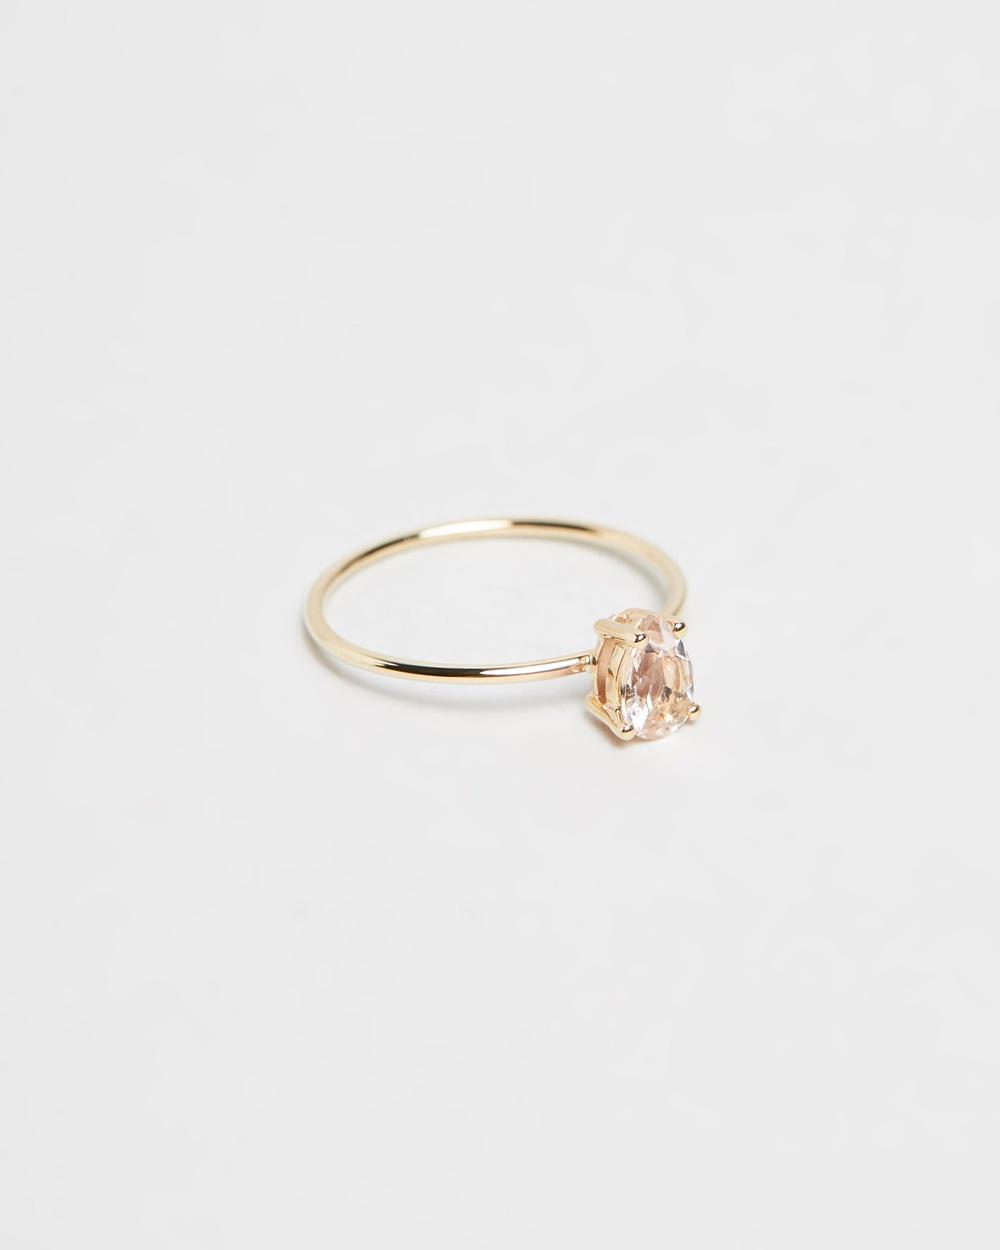 Natalie Marie Jewellery Tiny Pear Ring Morganite